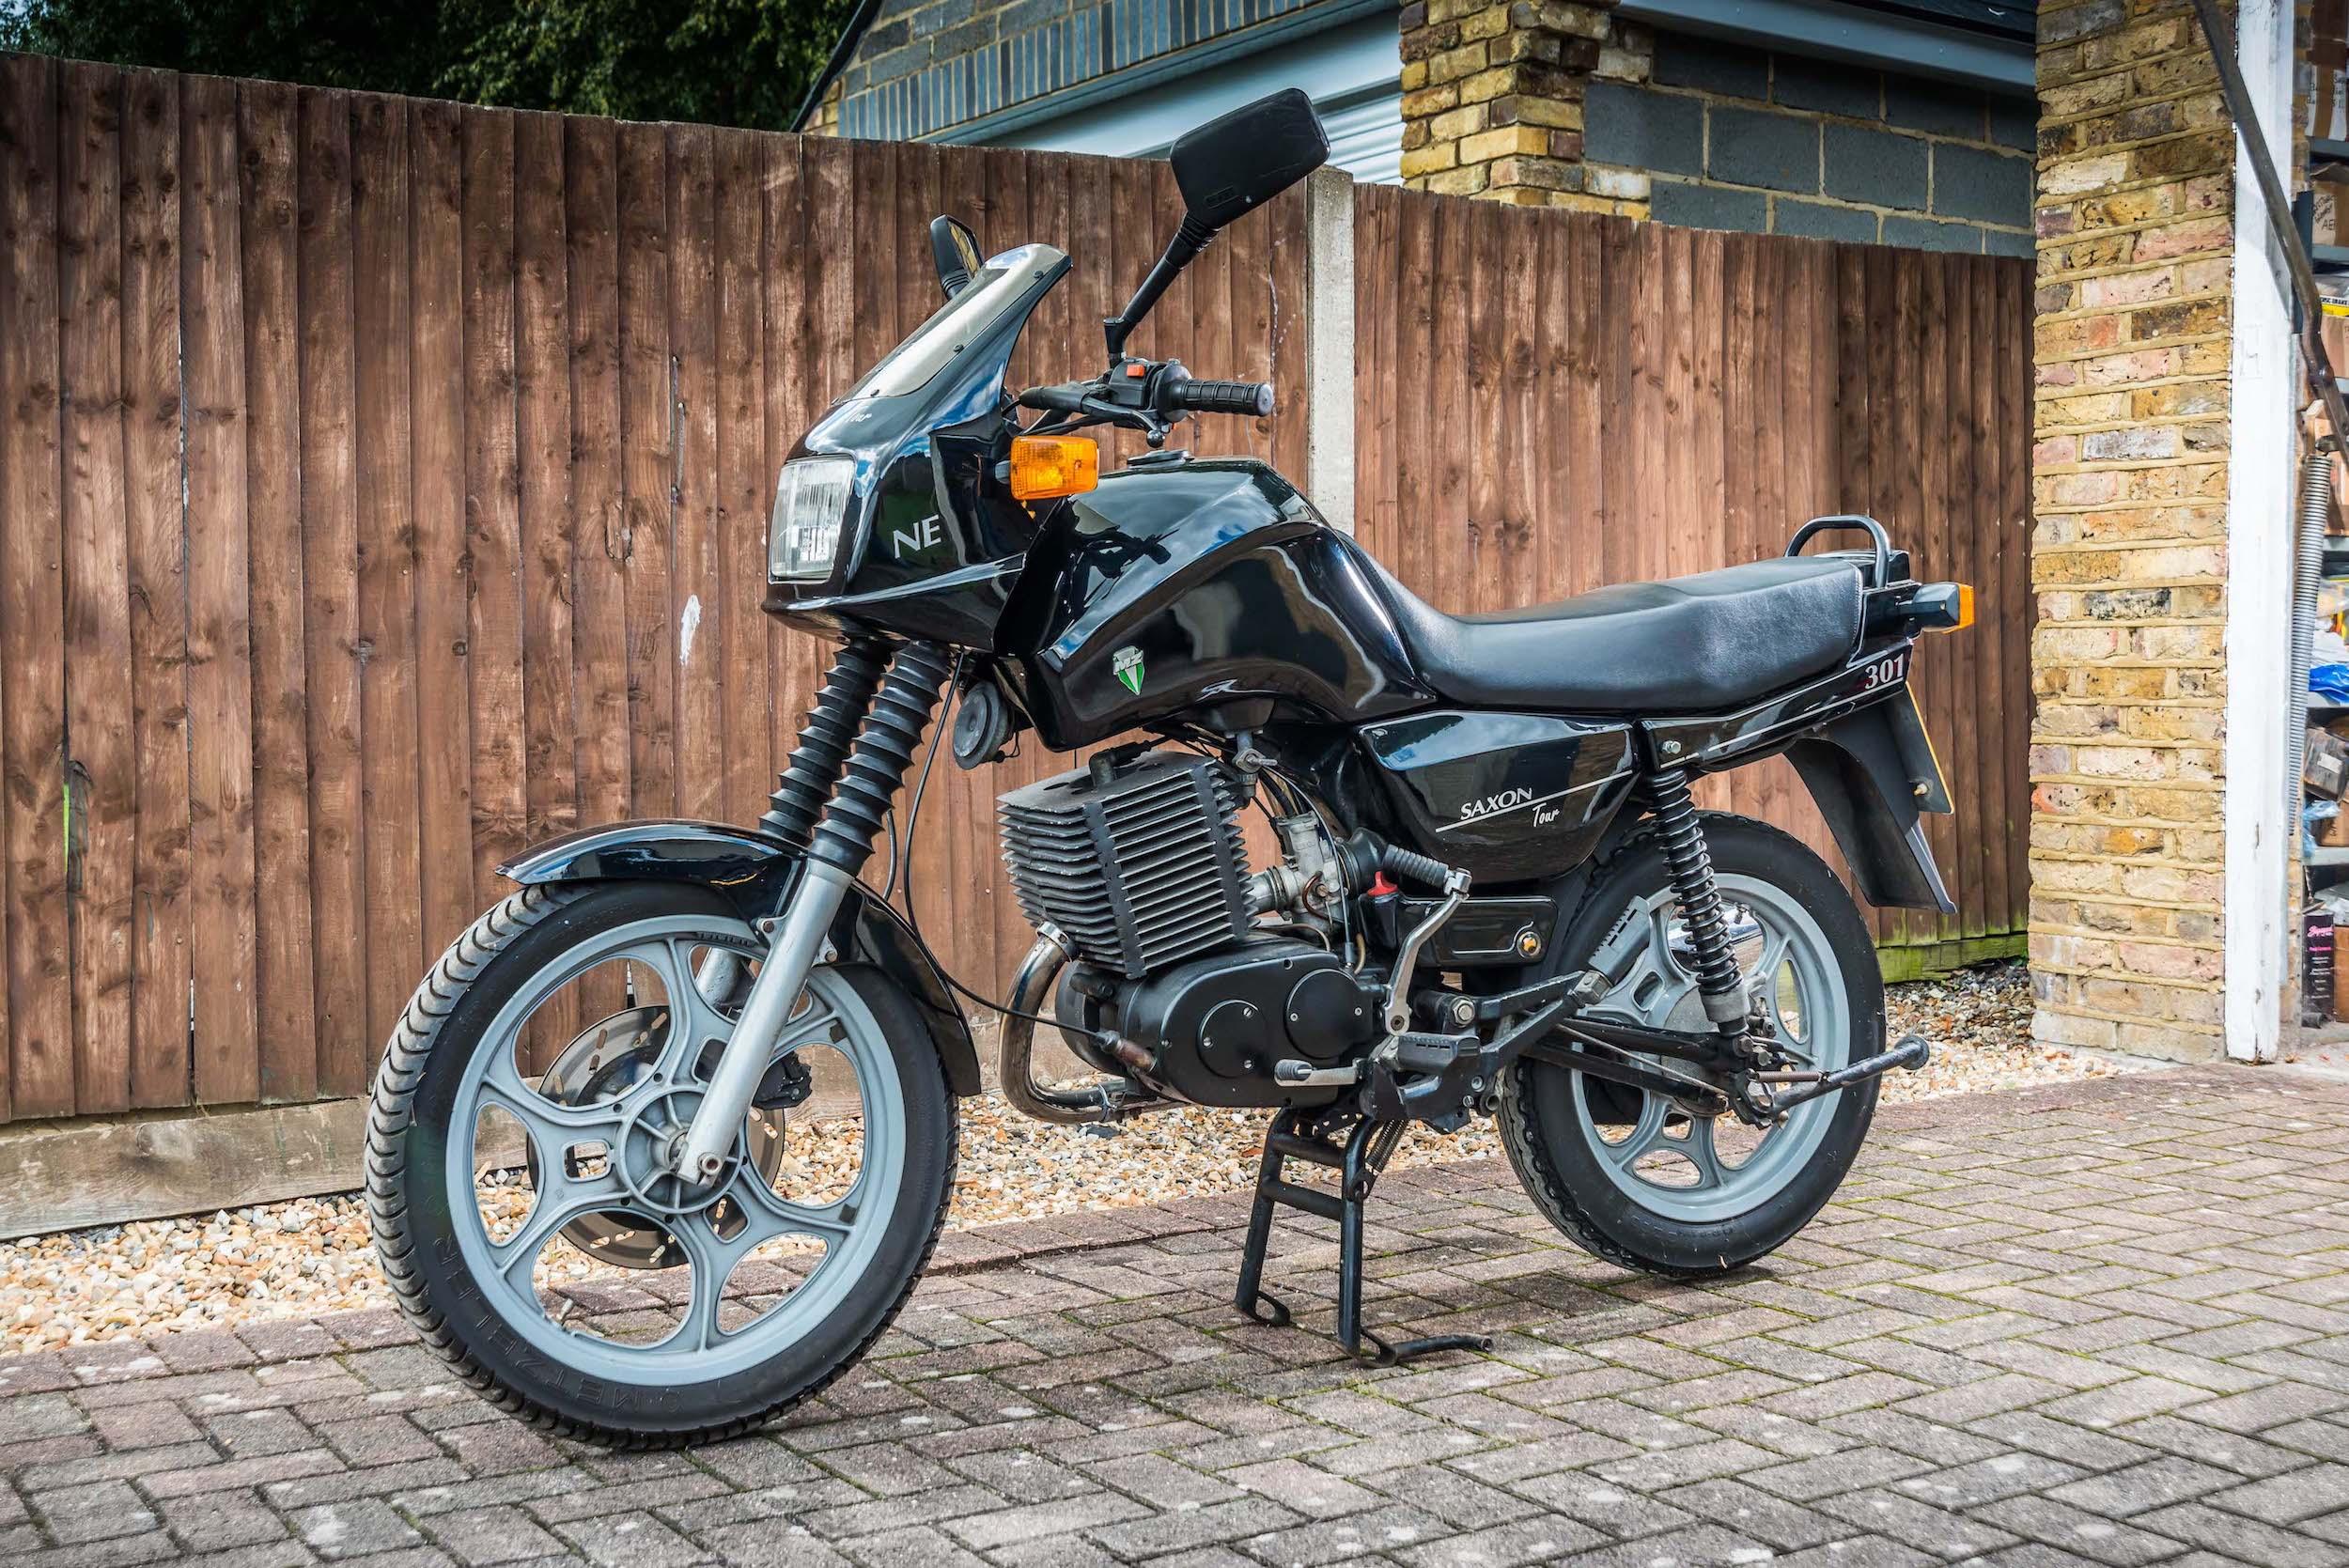 MZ Saxon motorcycle